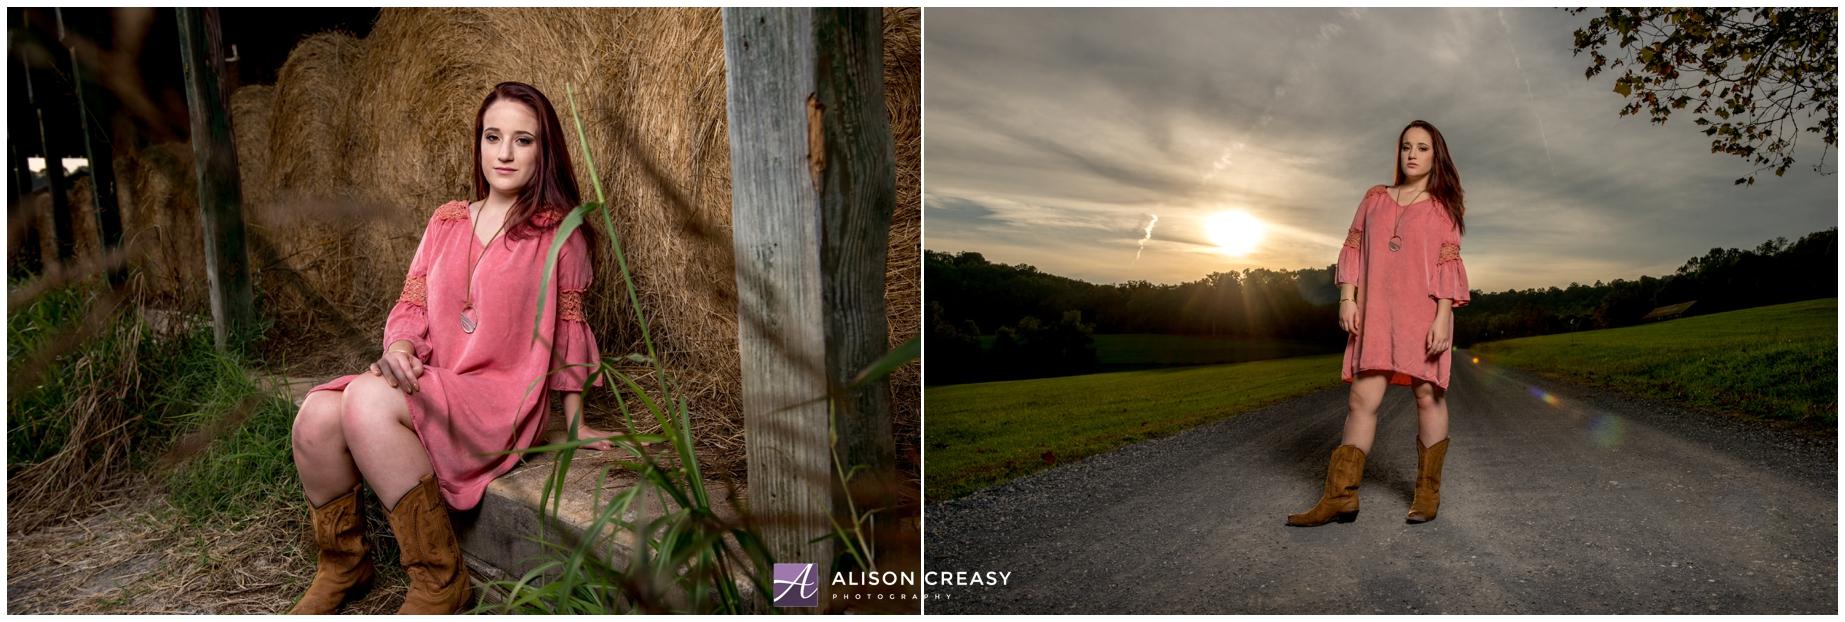 Alison-Creasy-Photography-Lynchburg-VA-Photographer_0963.jpg